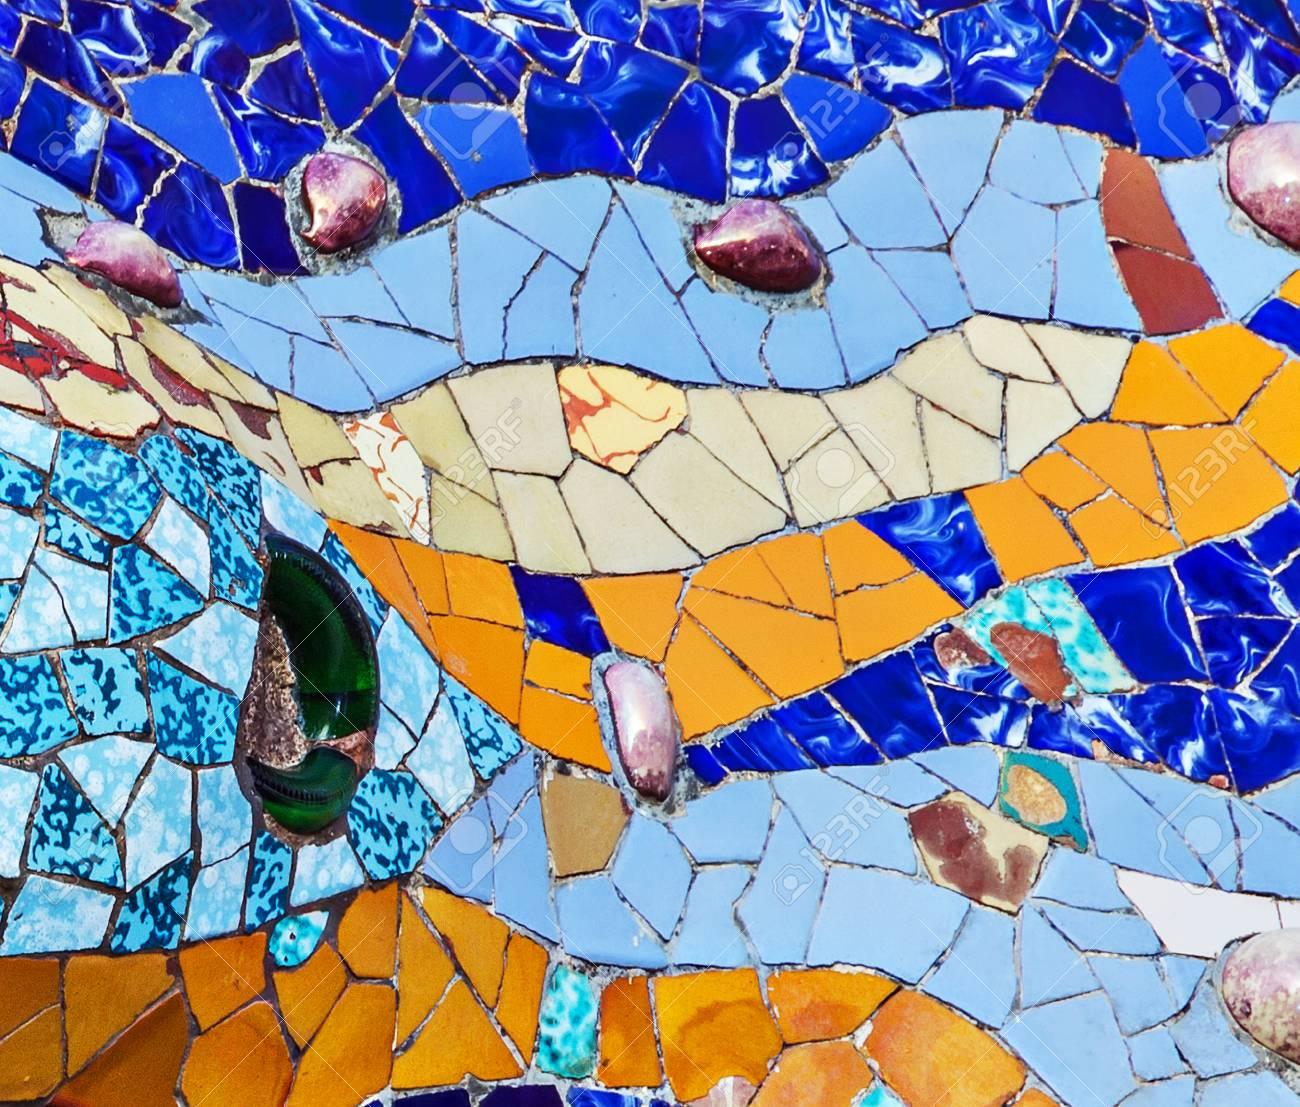 Texture Mosaic Of Colored Ceramic Tile By Antoni Gaudi At His ...